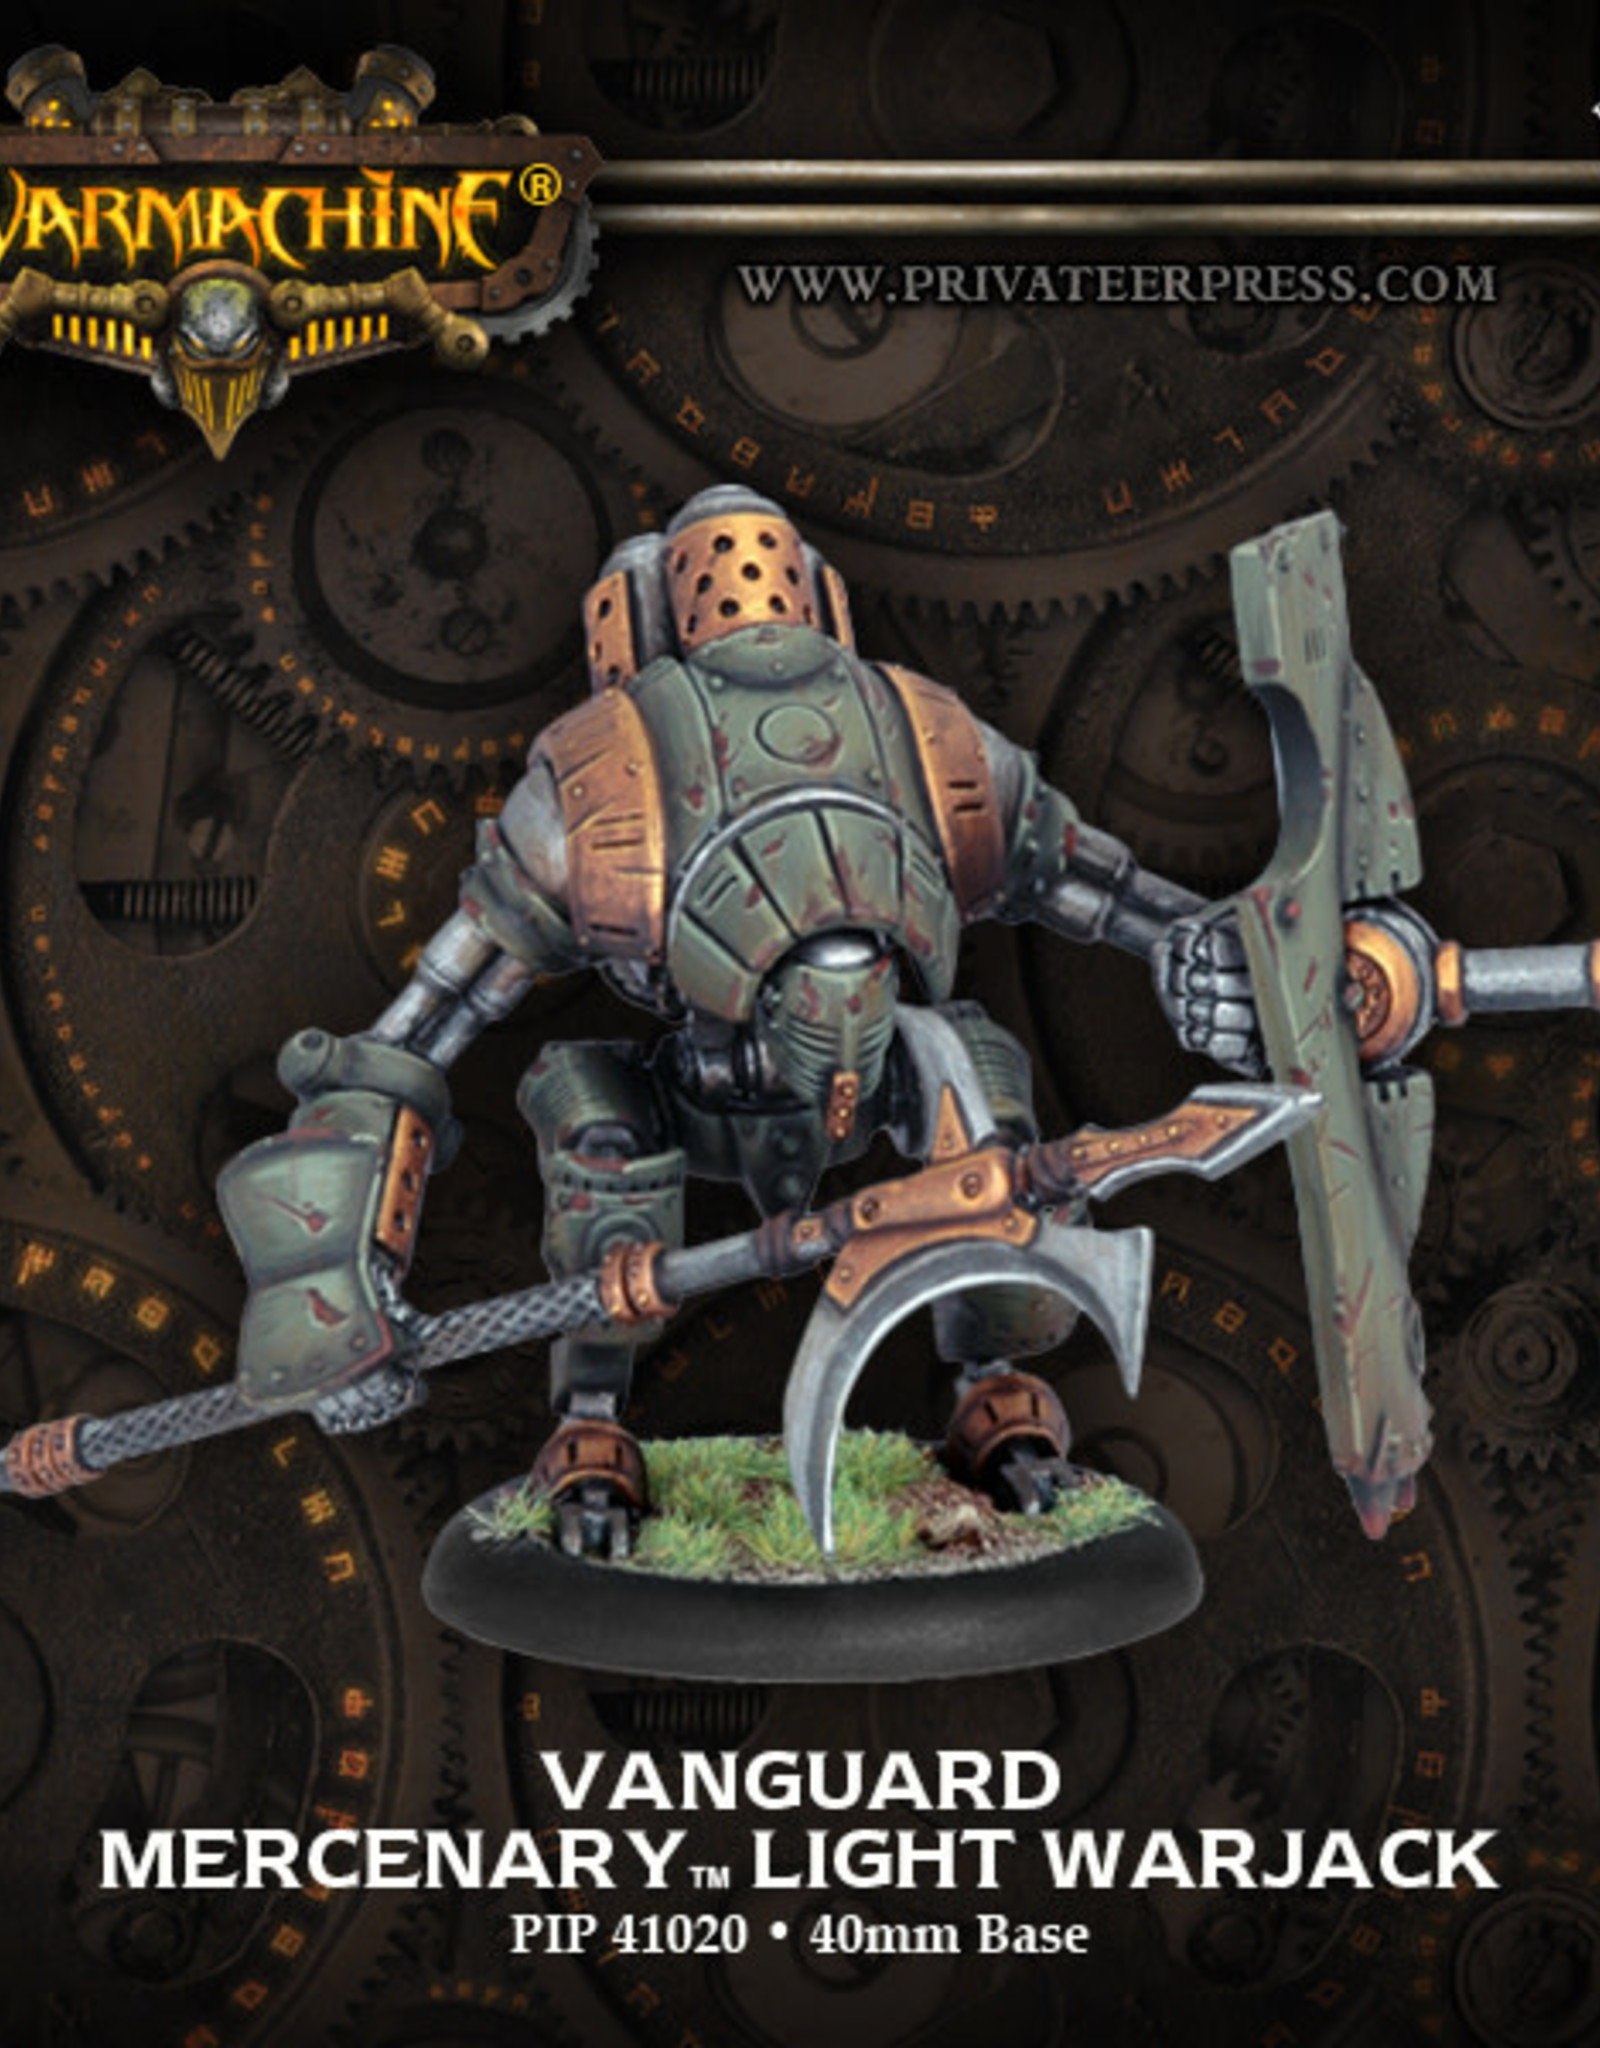 Warmachine Mercenaries - Vanguard